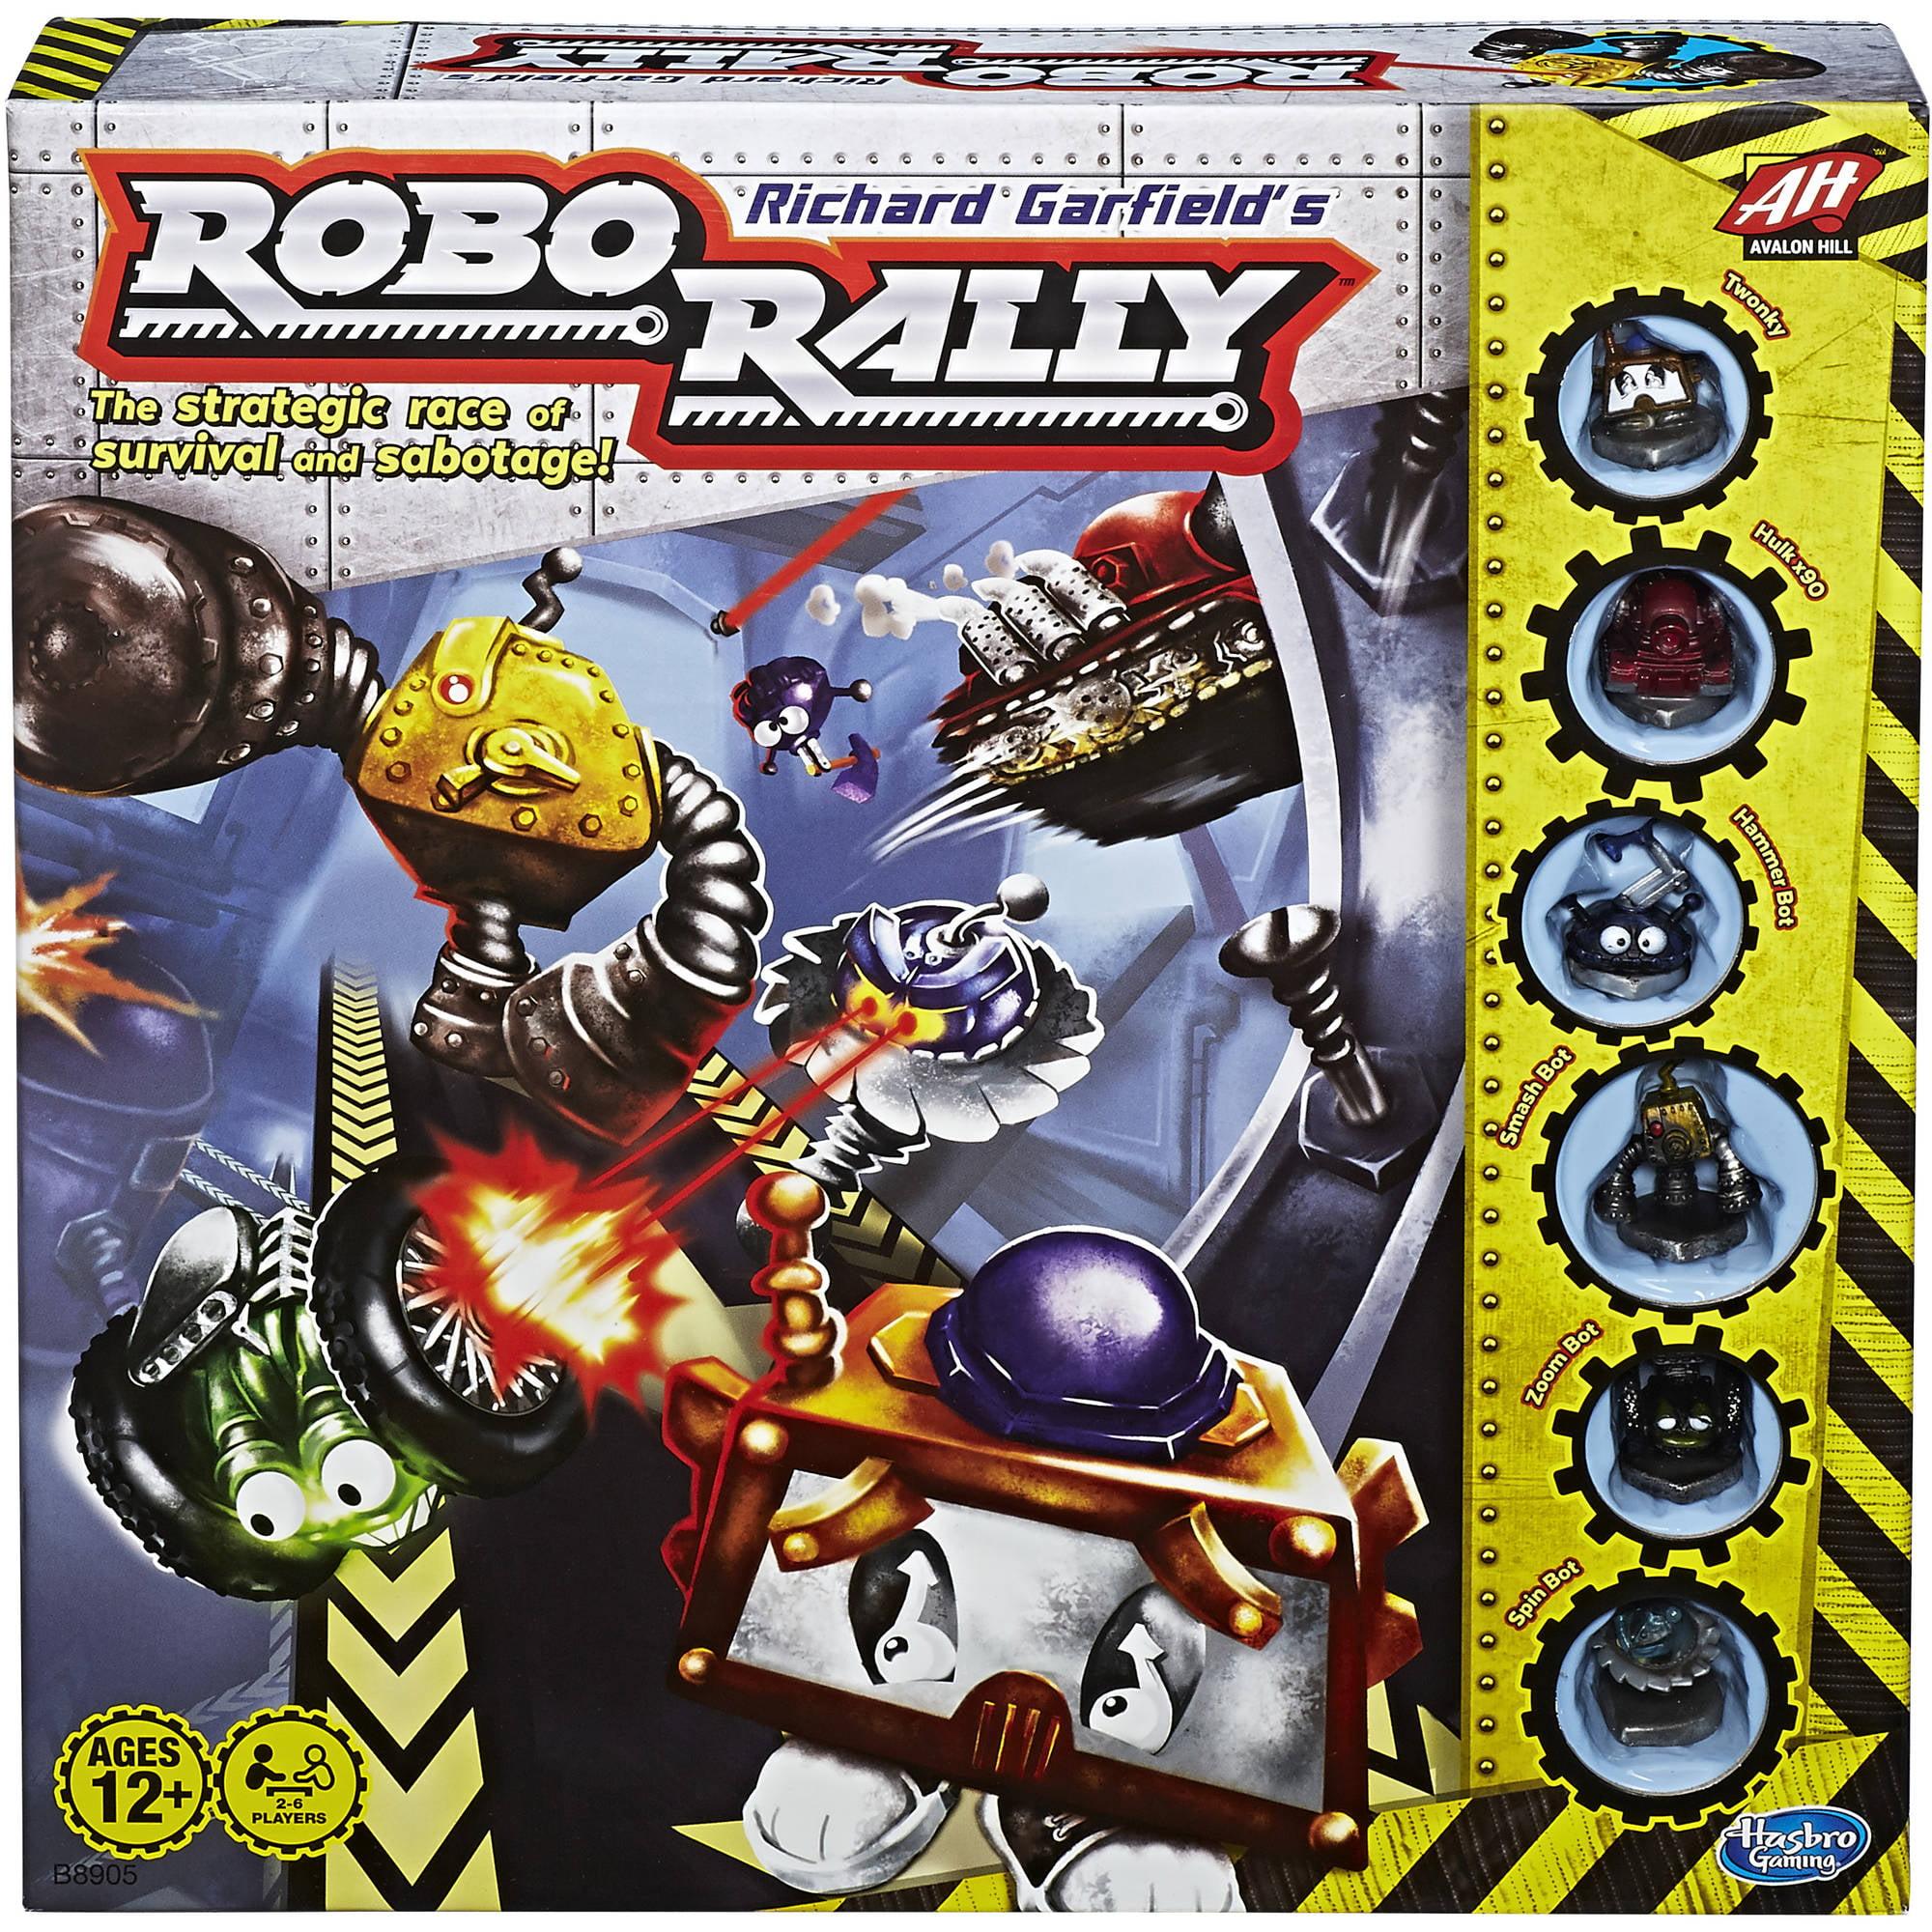 Richard Garfield's Robo Rally Avalon Hill Game by Hasbro, Inc